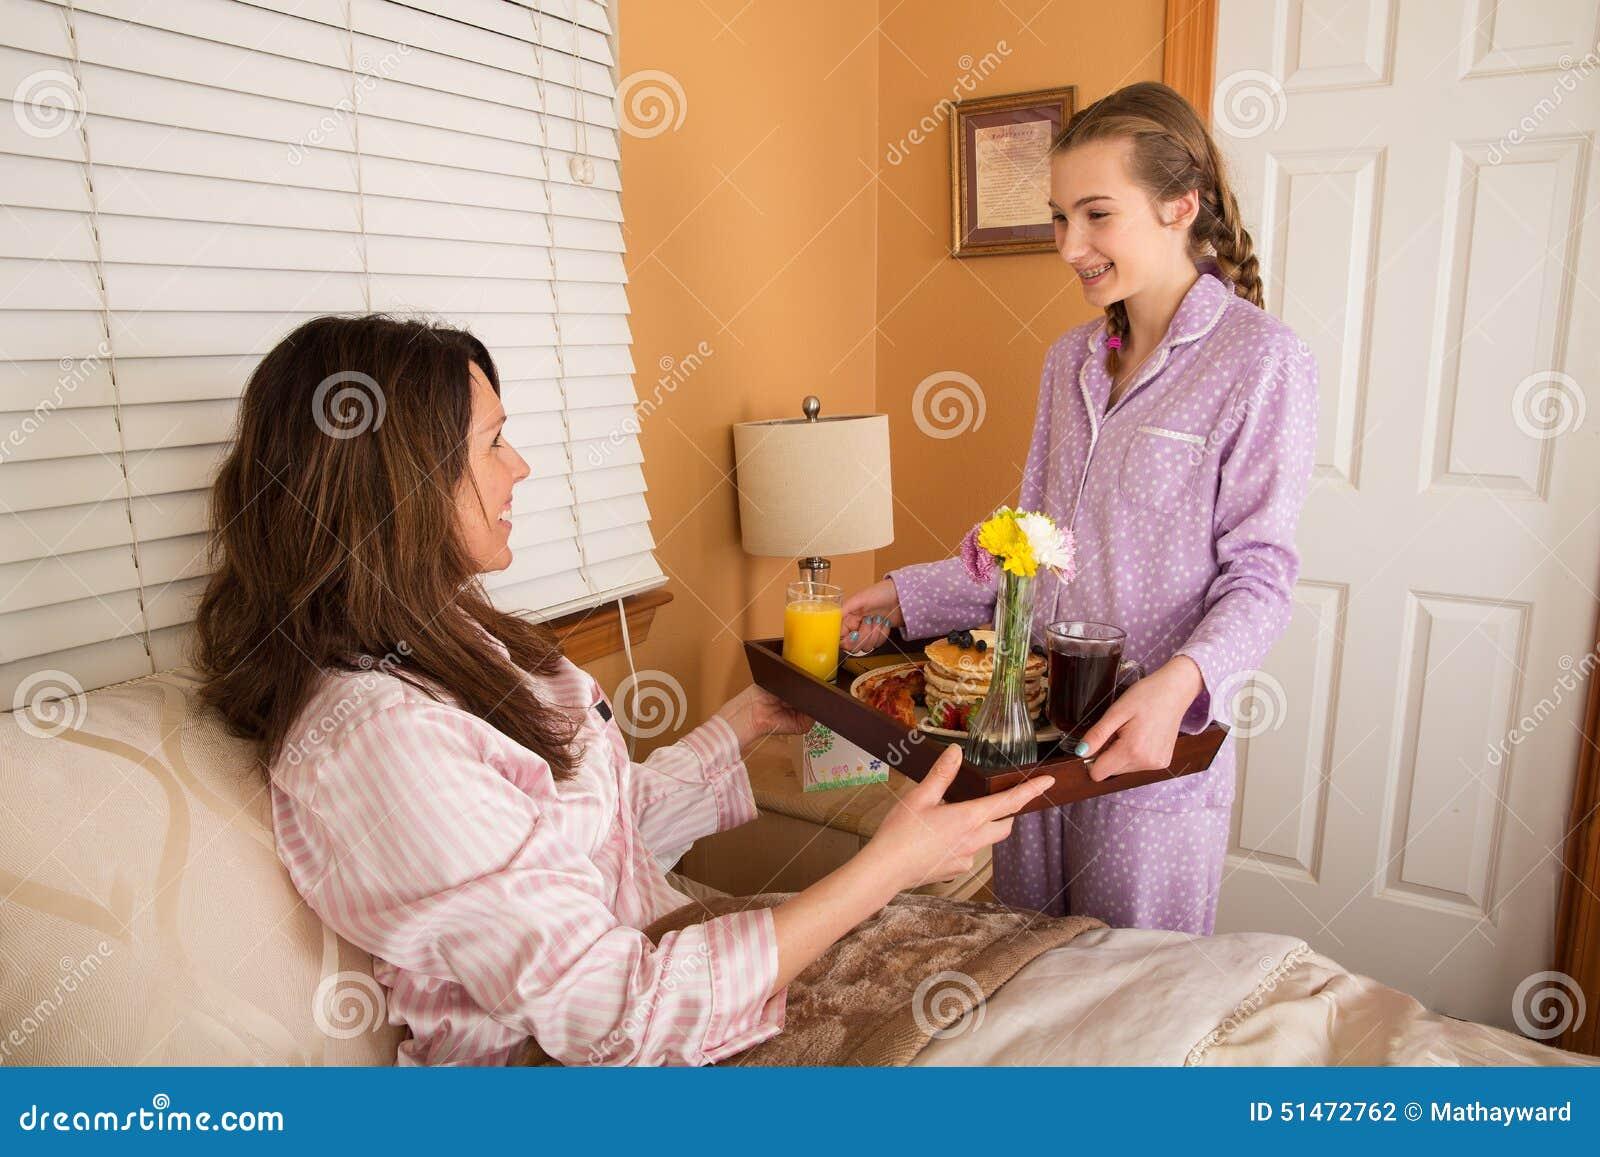 teenage girl serving mom breakfast in bed stock photo - image